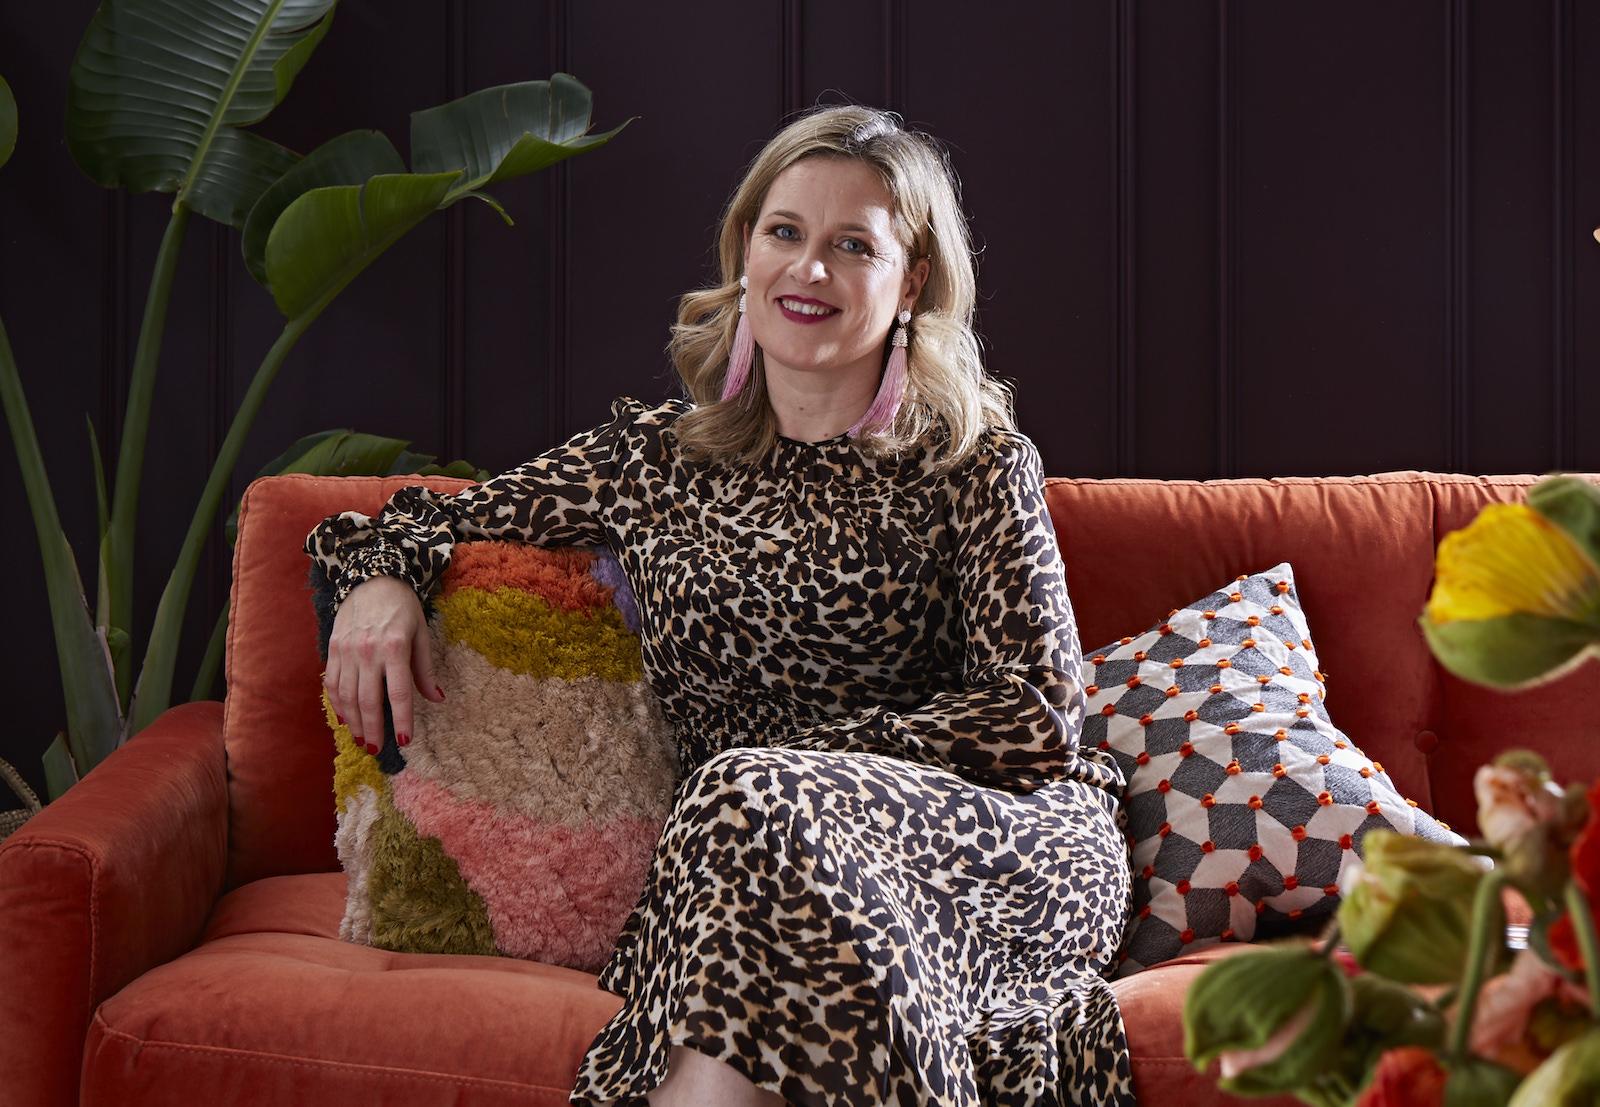 interior designer sophie robinson in leopard print dress